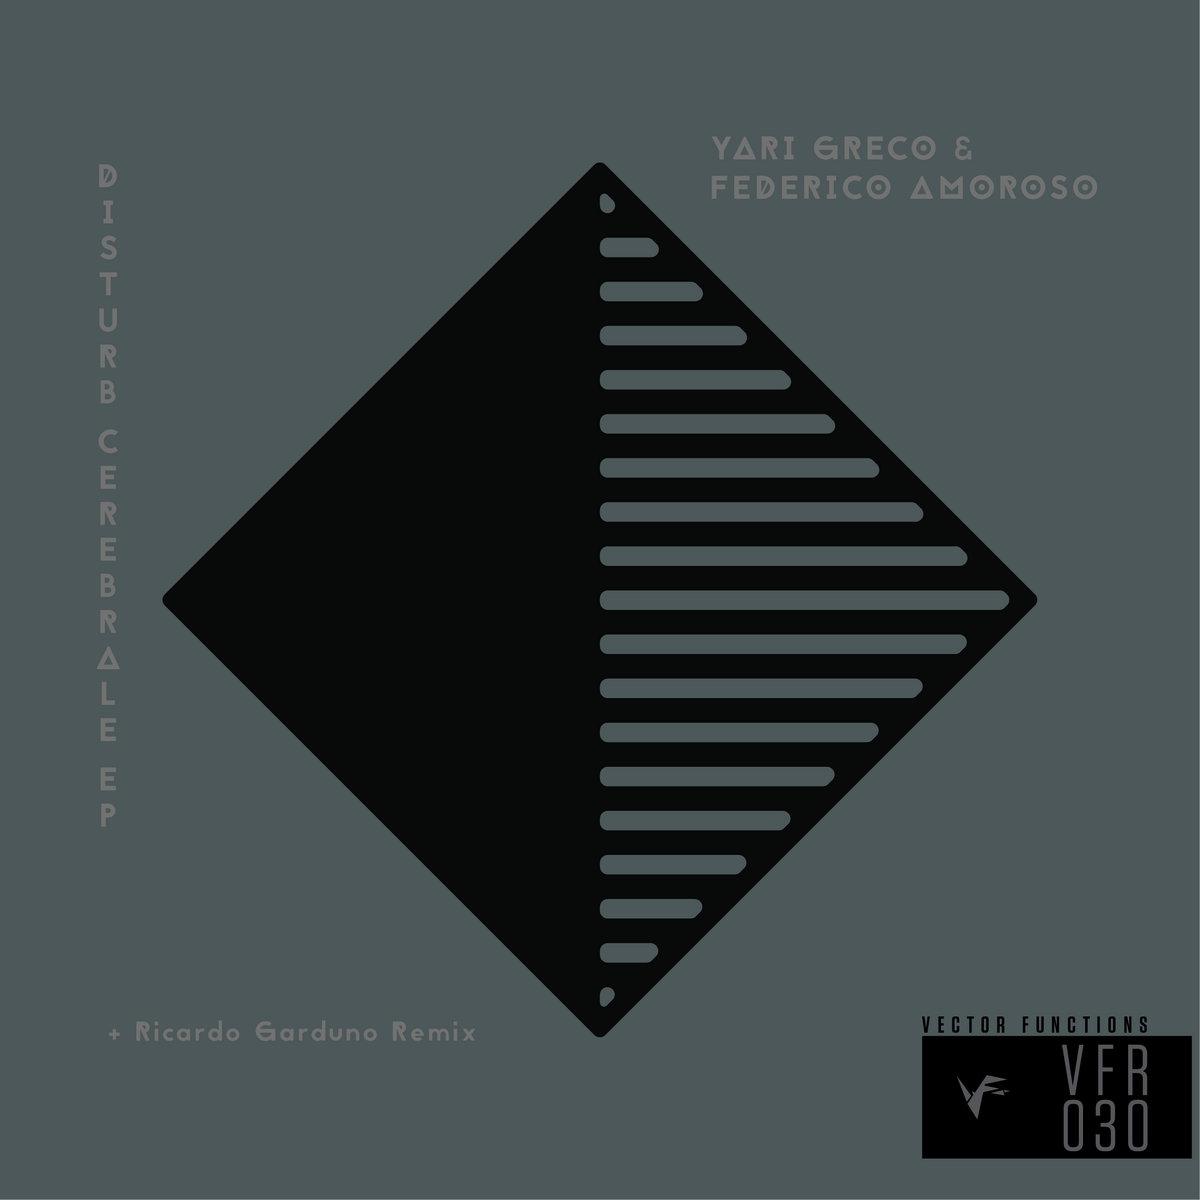 Yari Greco Federico Amoroso Energy State Original Mix Vector